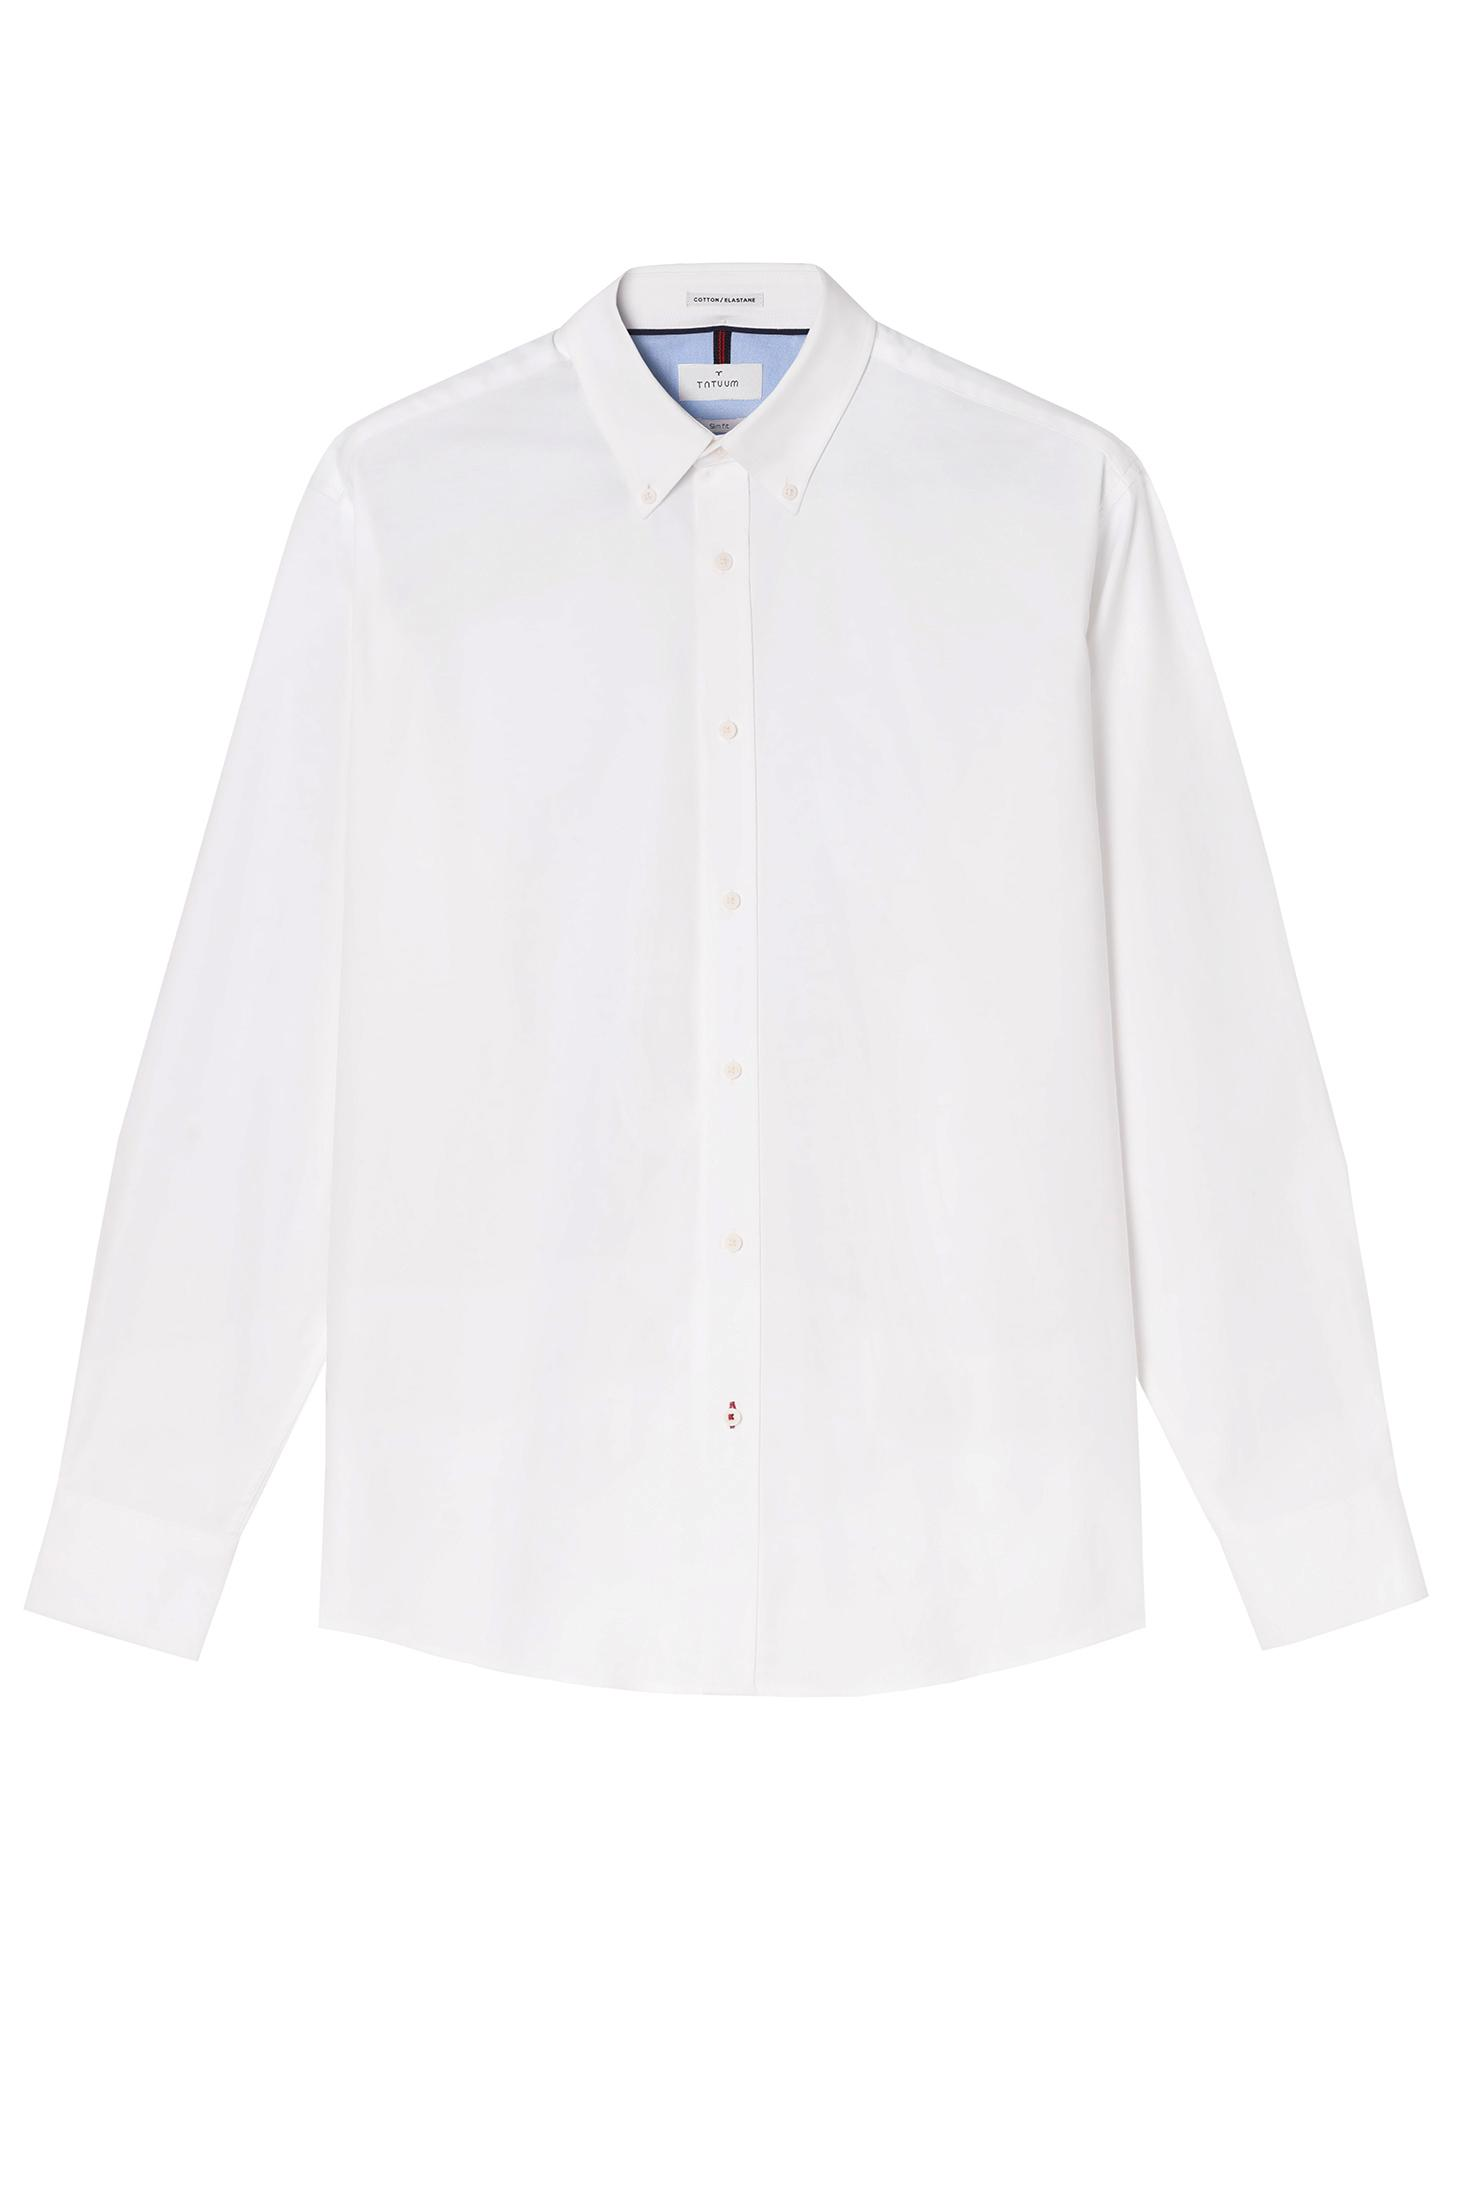 koszula męska długi r. MELLEN MODERN